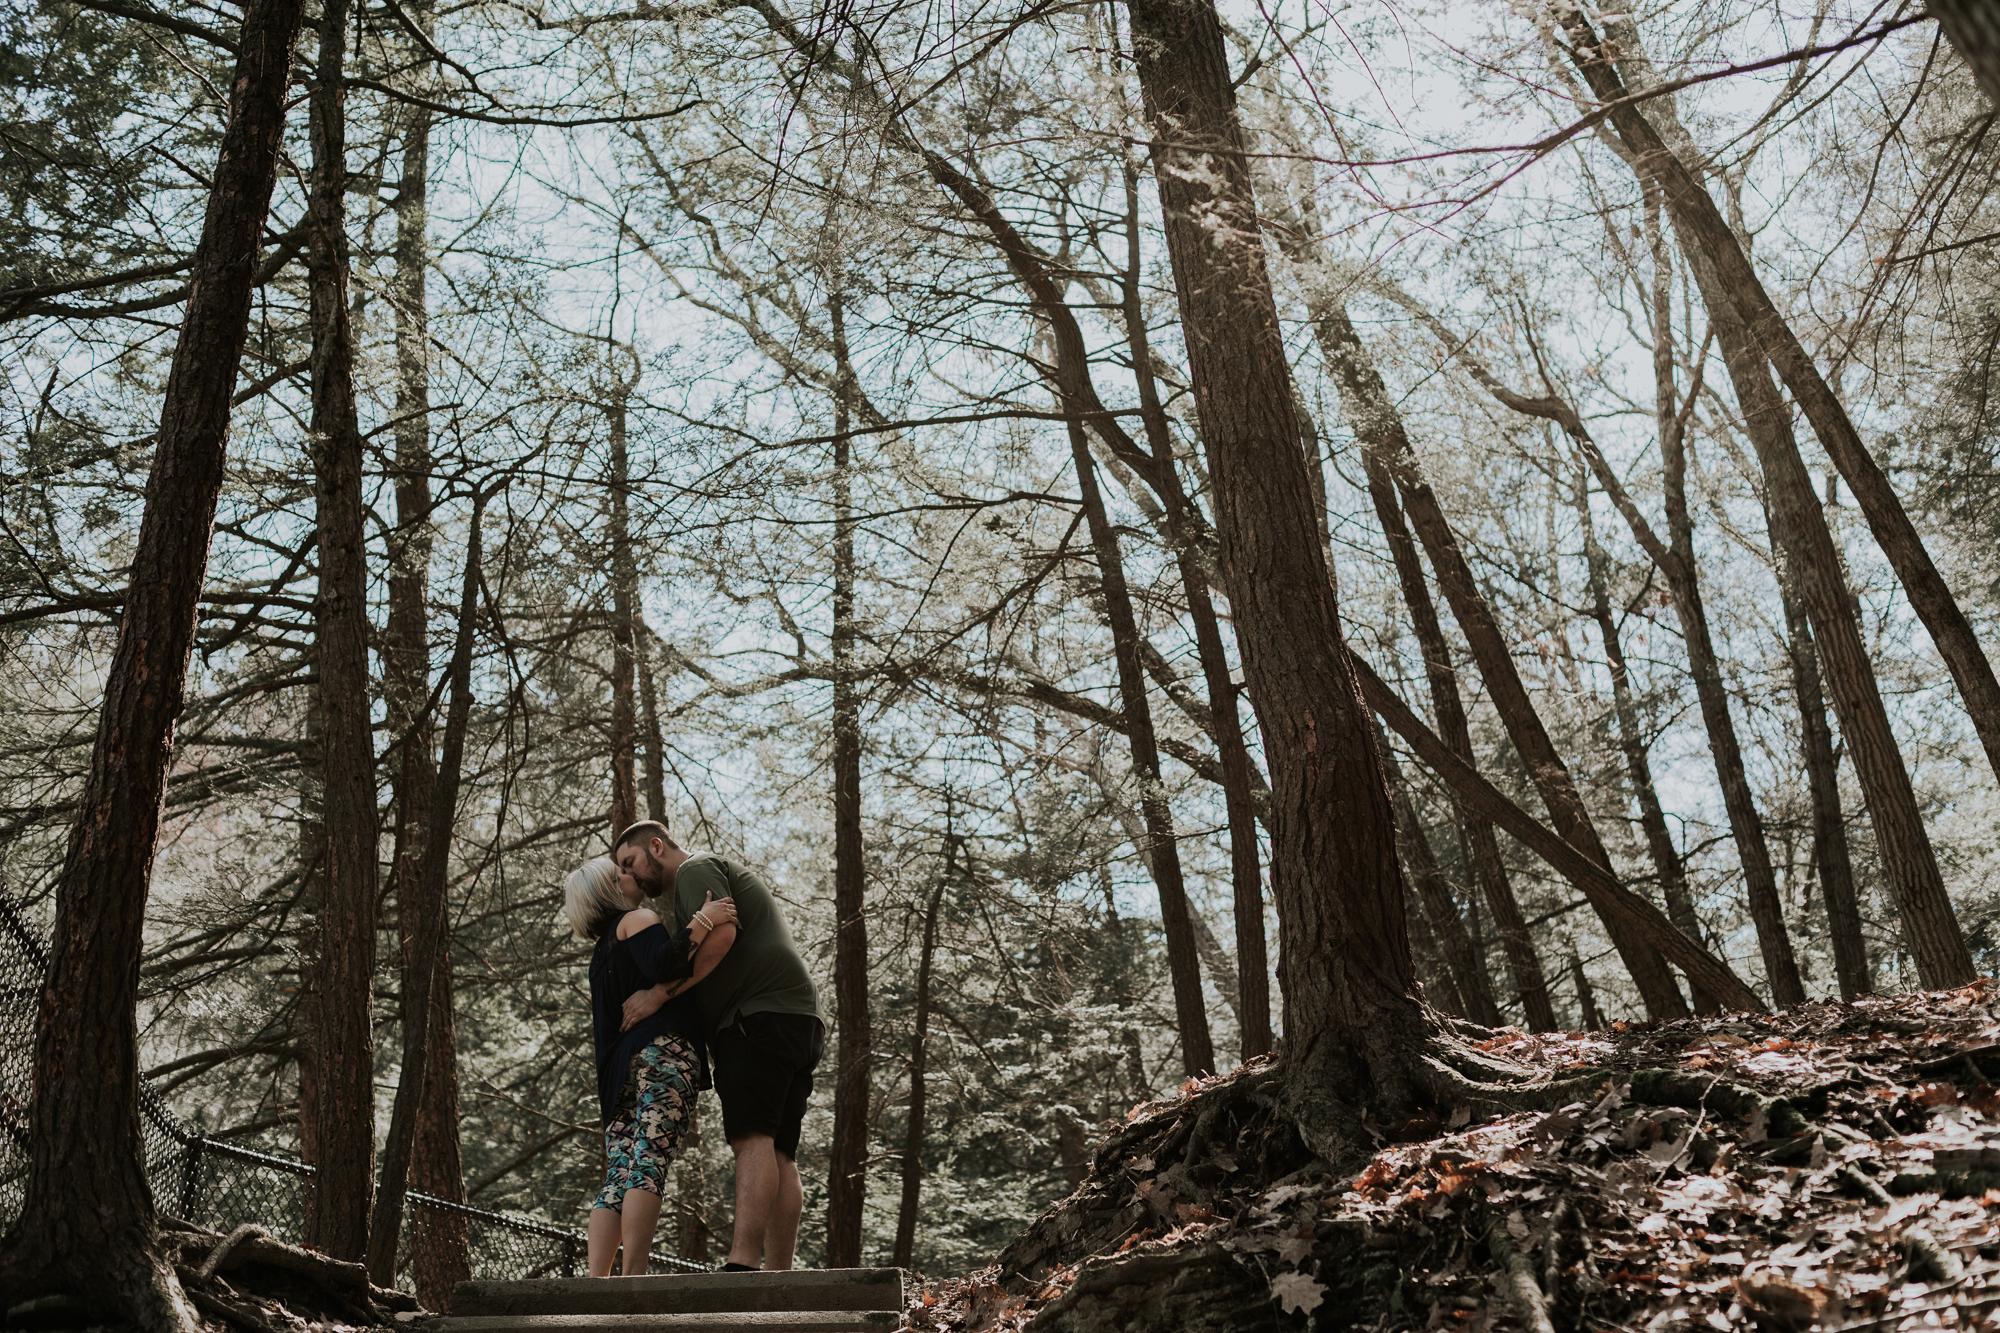 buttermilk-falls-state-park-engagement-photography-24-mm-lens